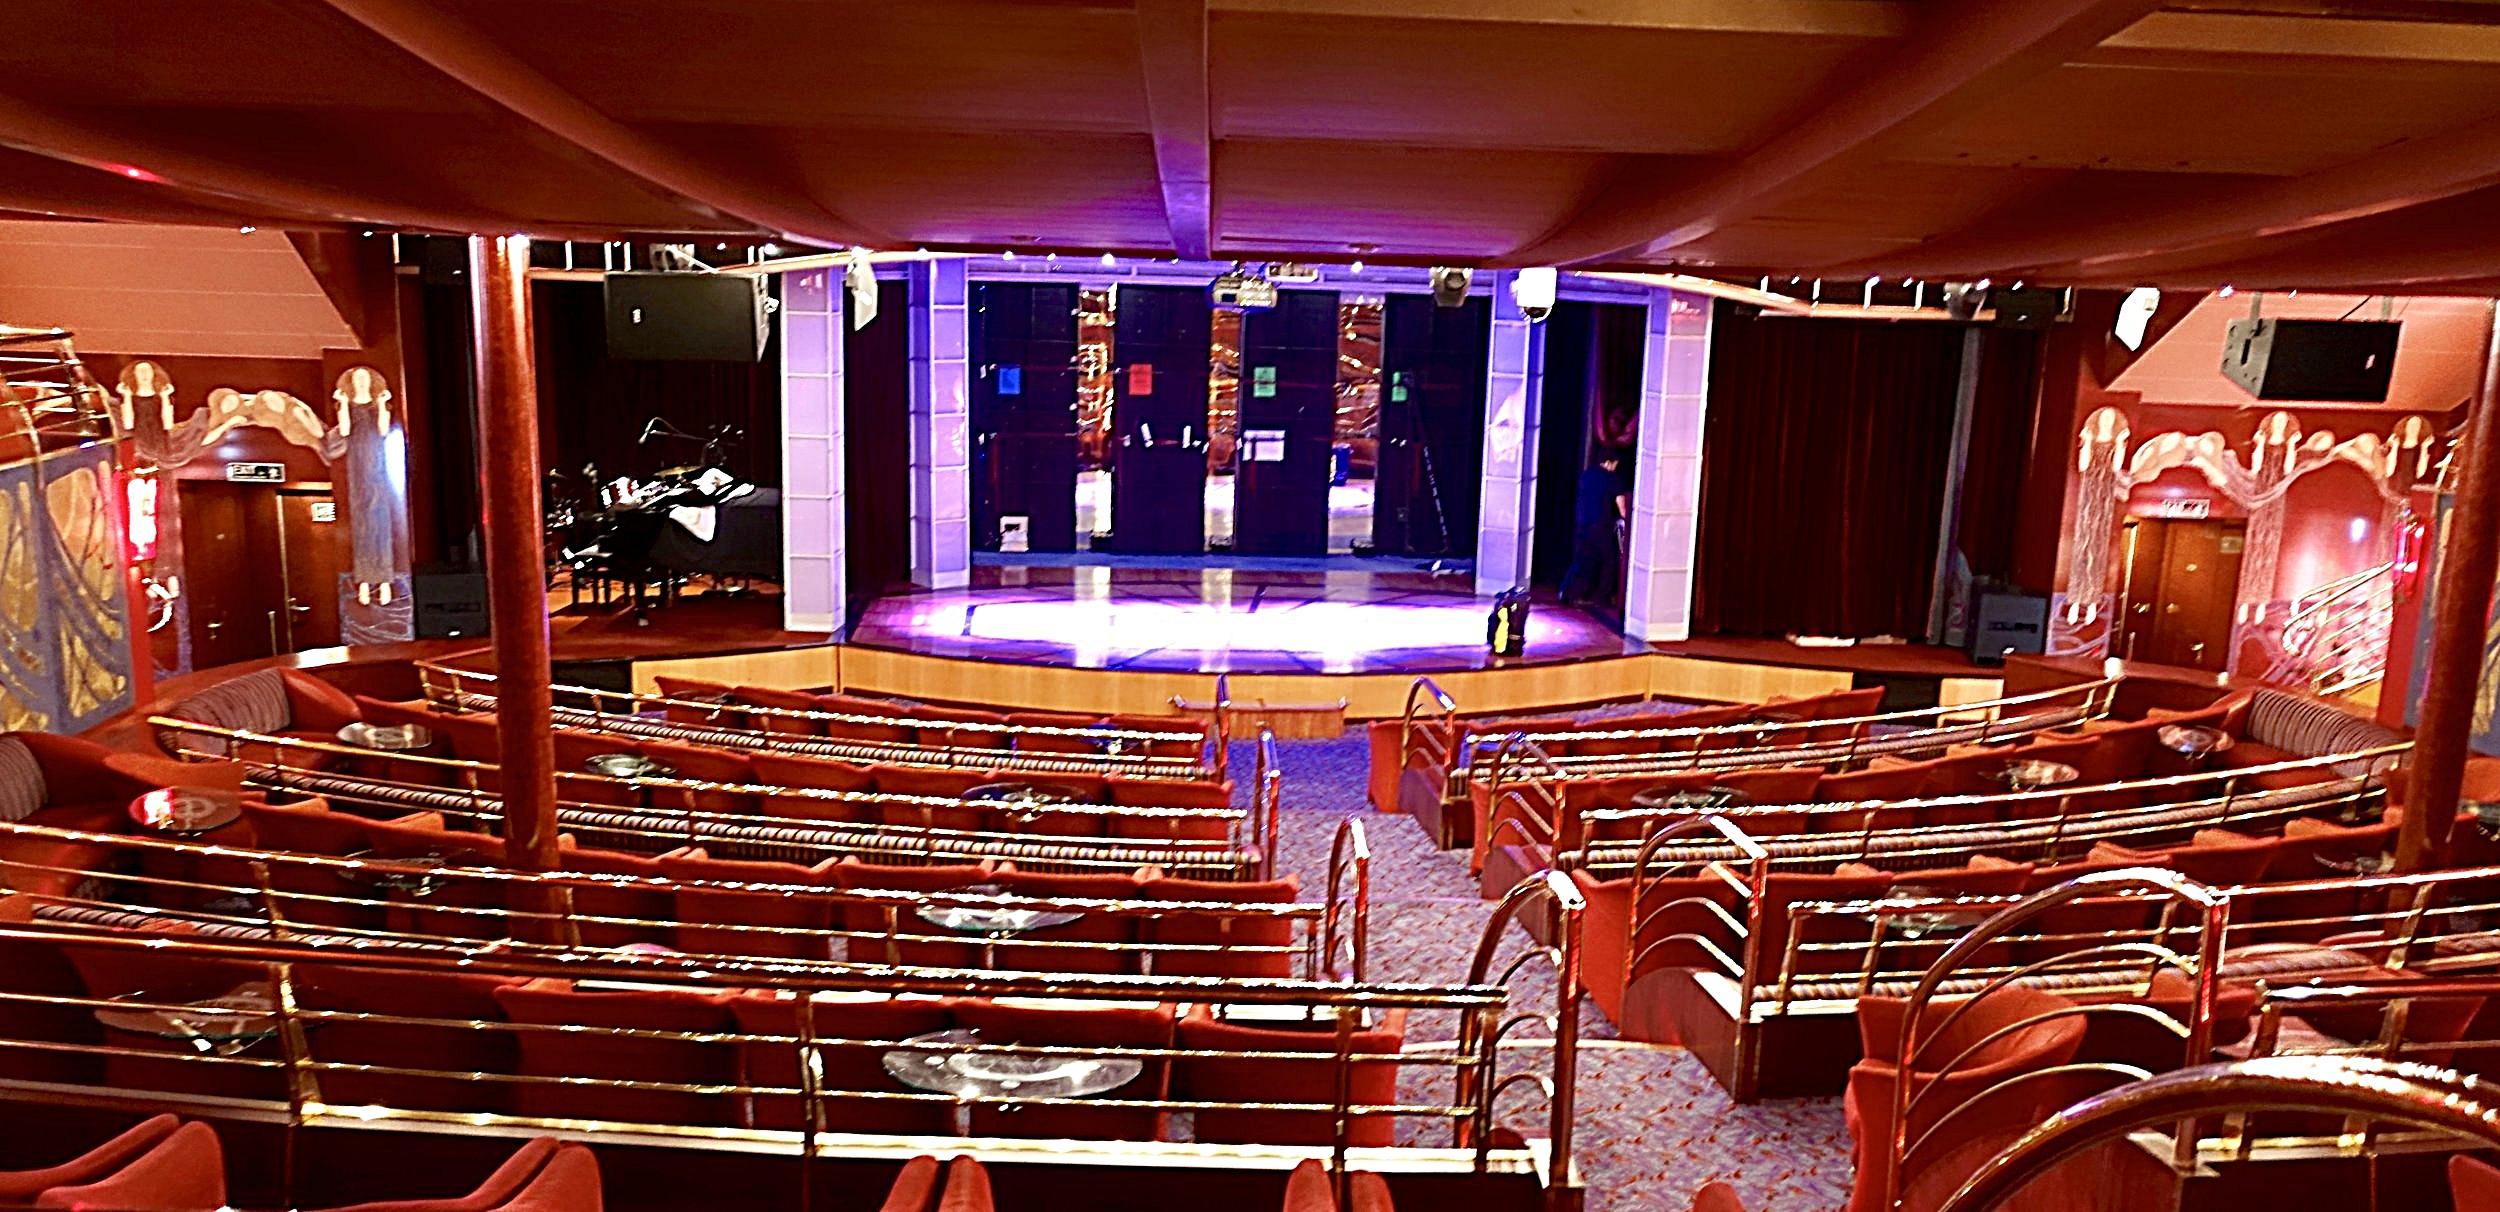 The rather grand theatre.